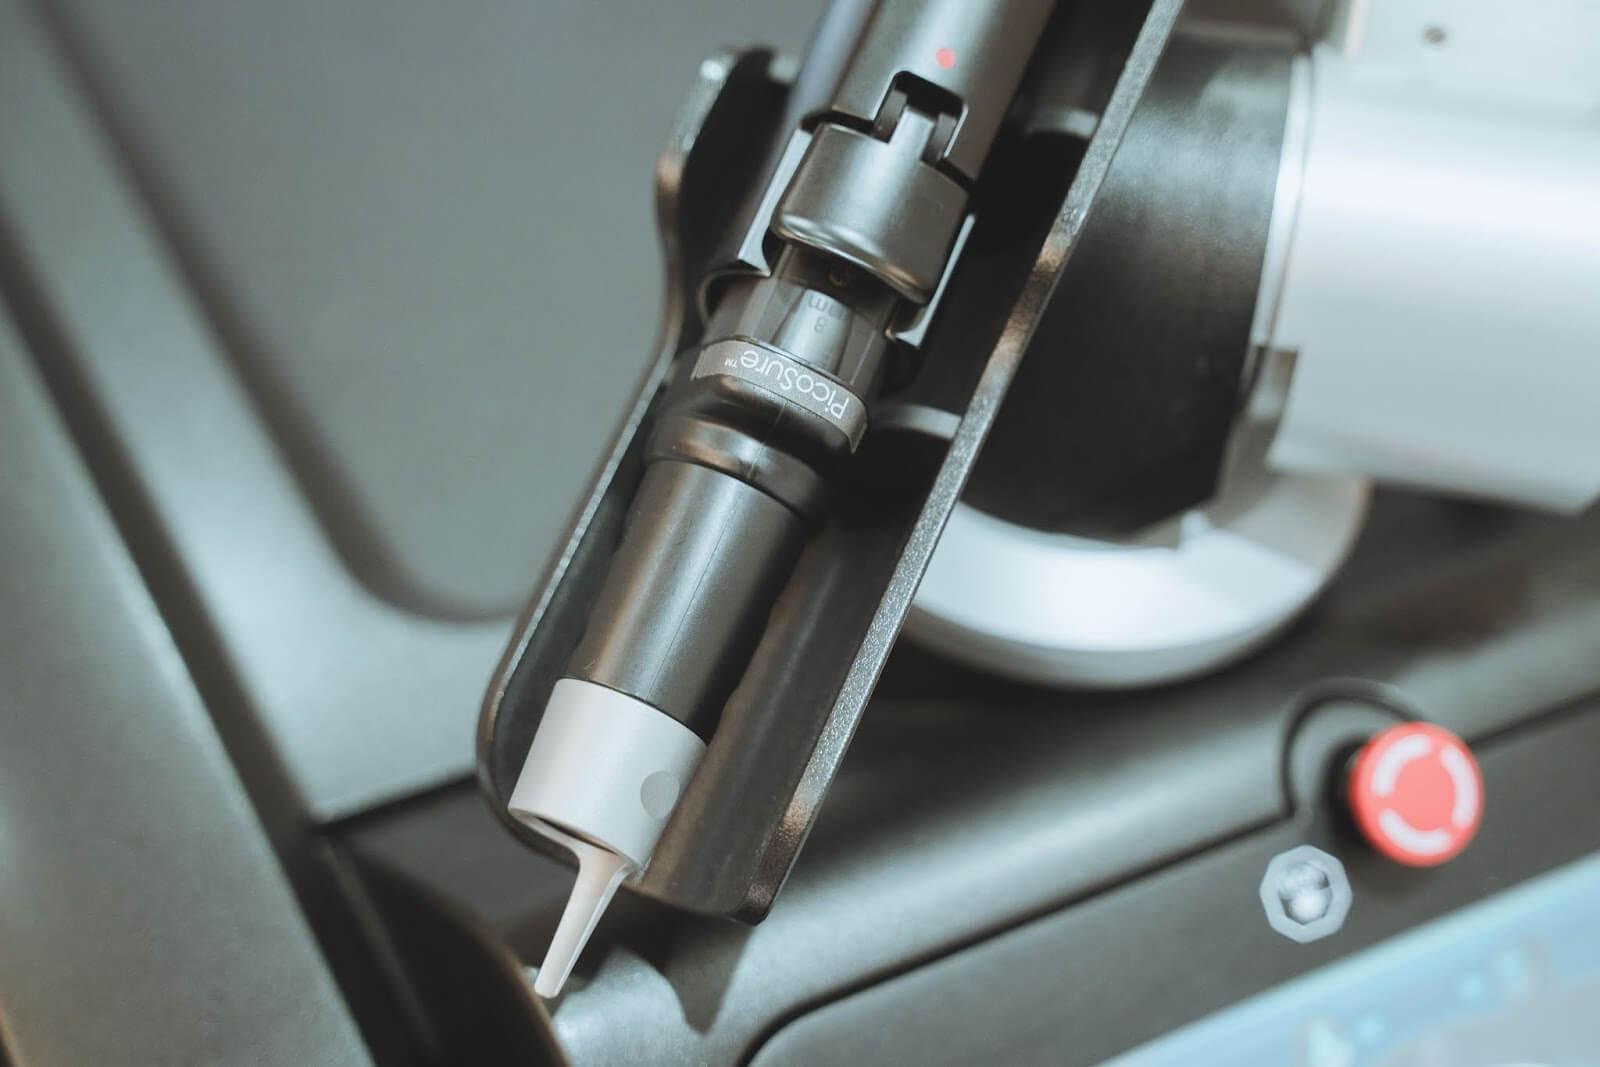 Picosure755皮秒雷射蜂巢透鏡